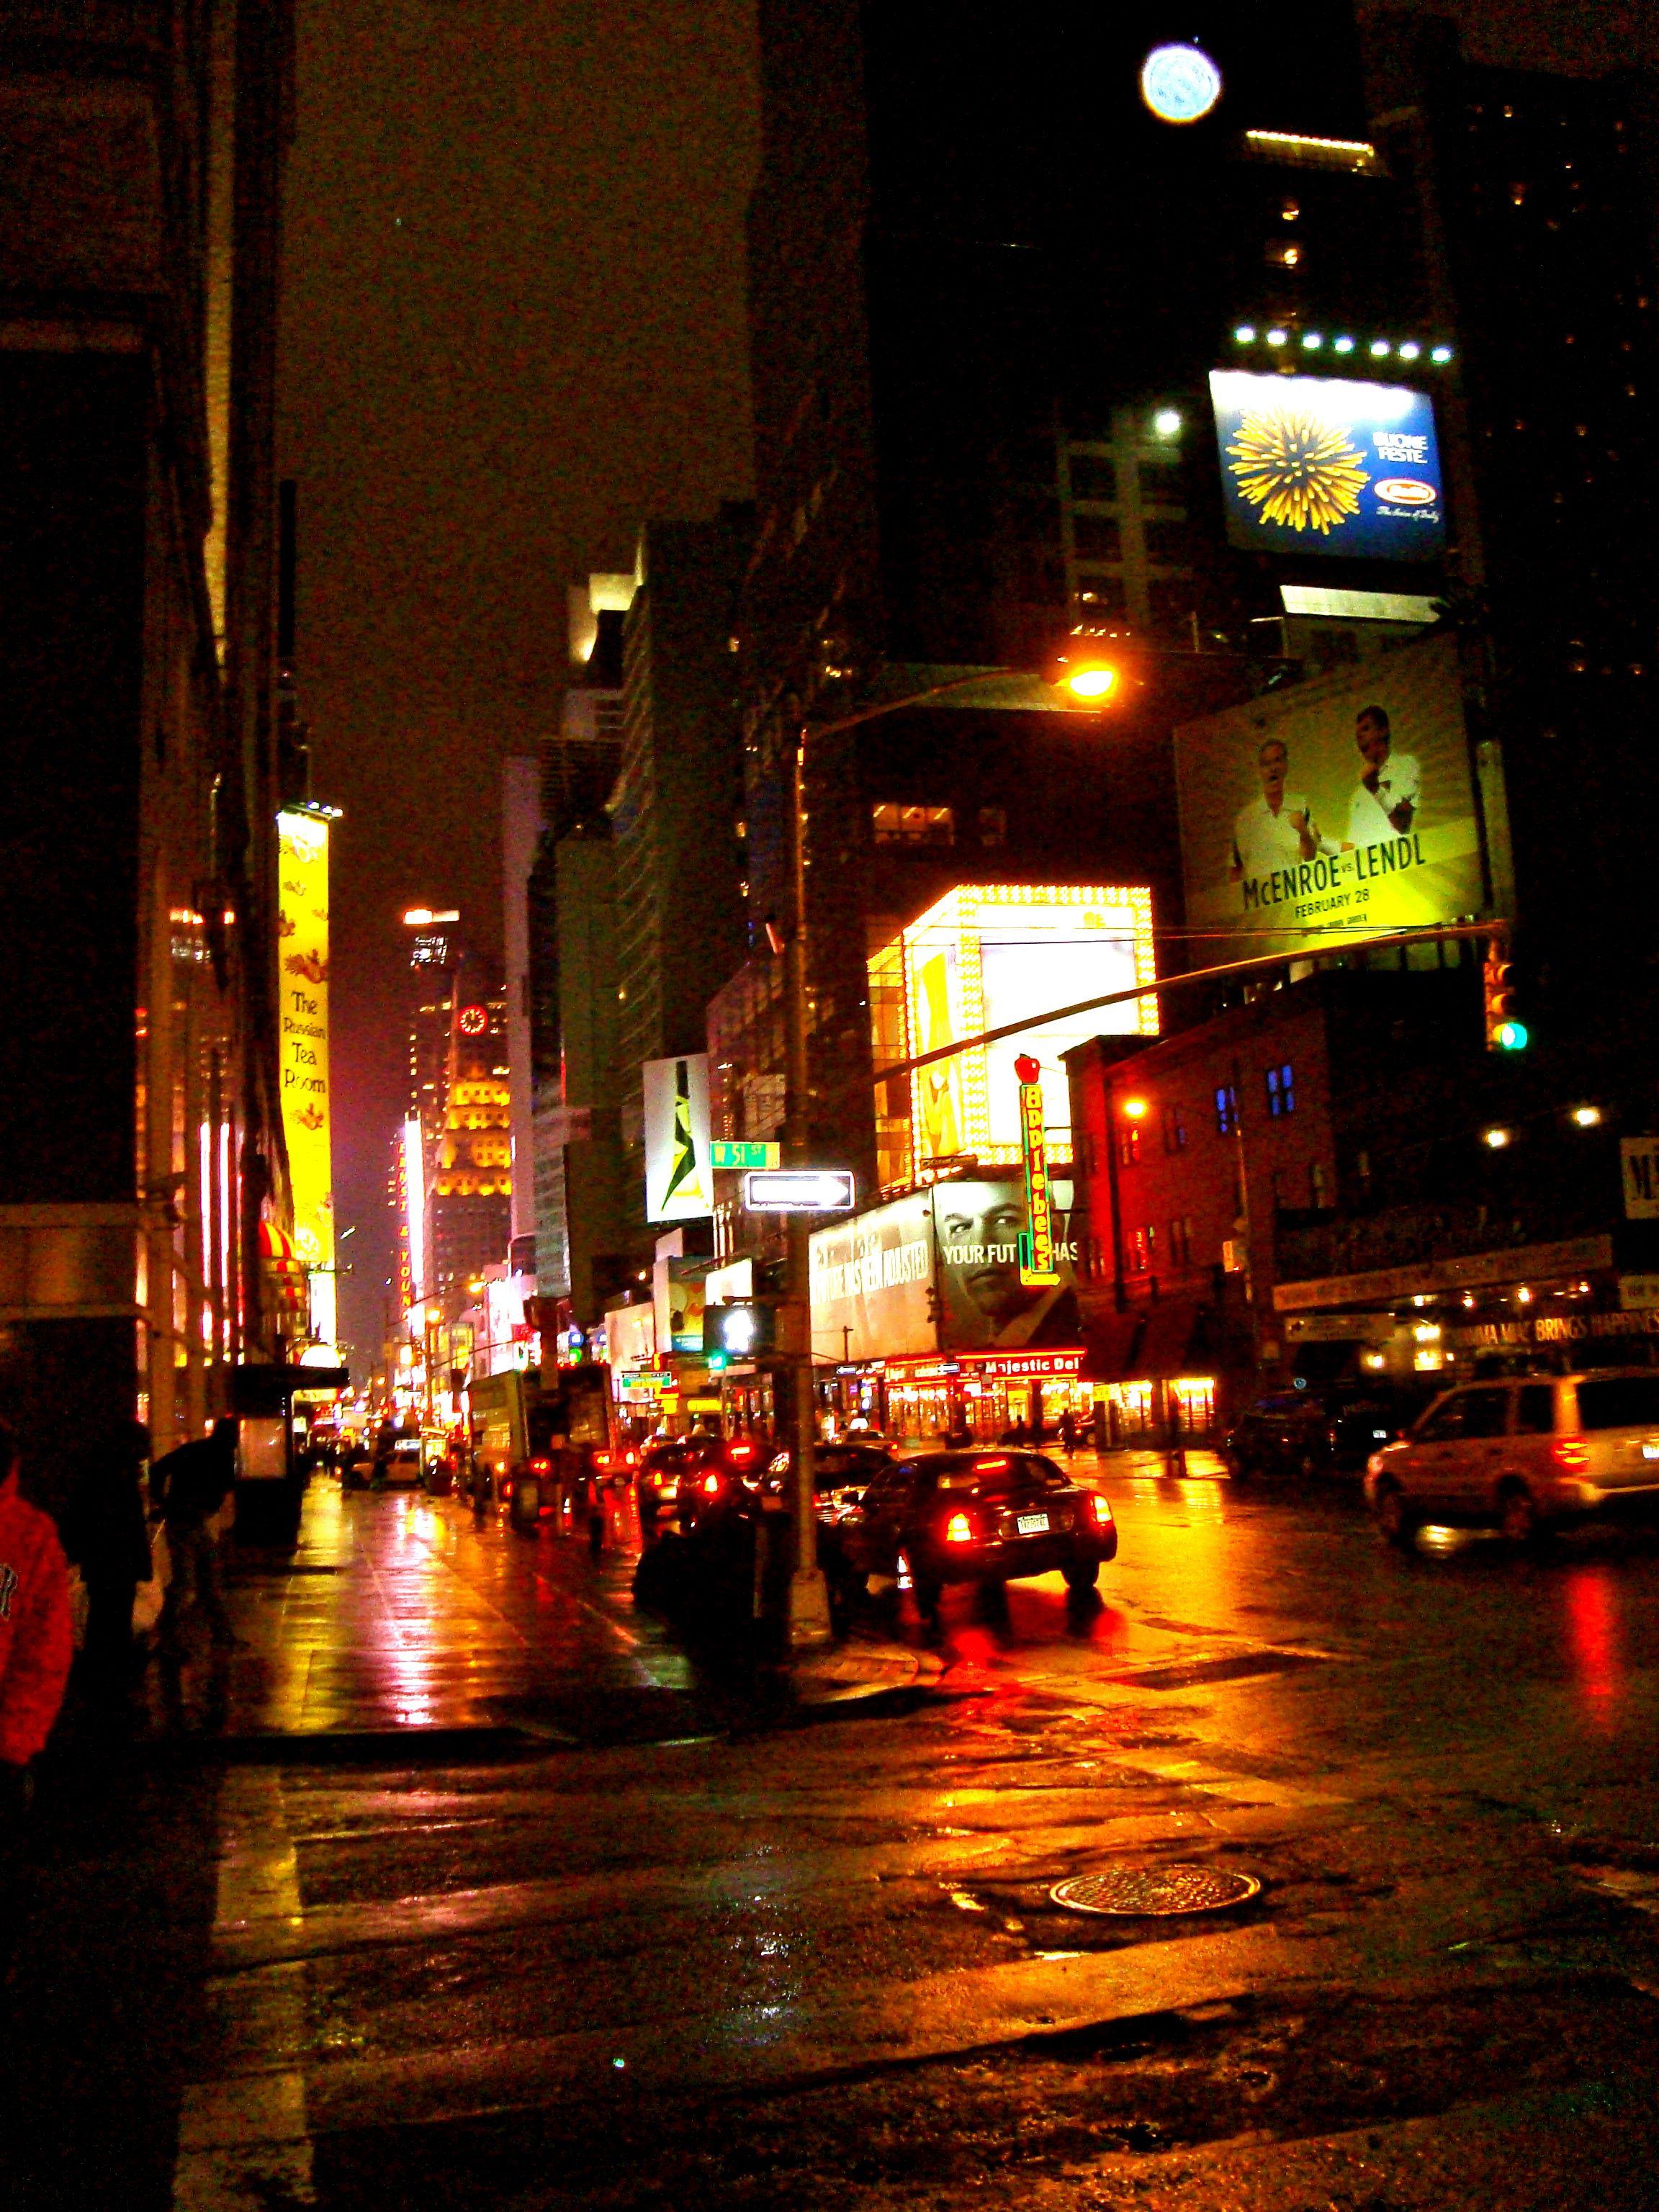 Lights and Slick Streets (New York City)